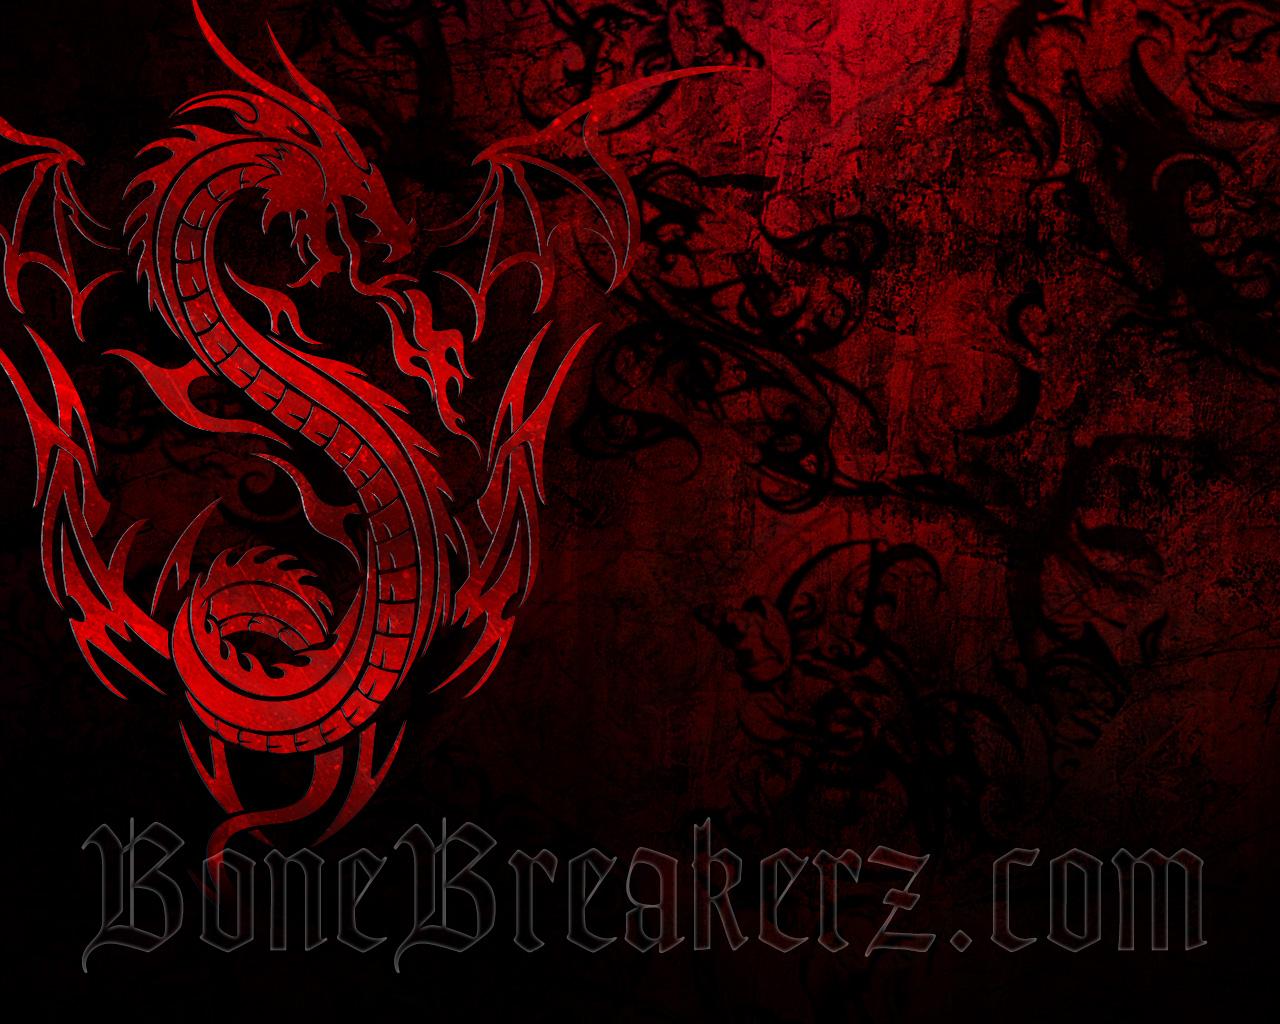 49 Red And Black Dragon Wallpaper On Wallpapersafari